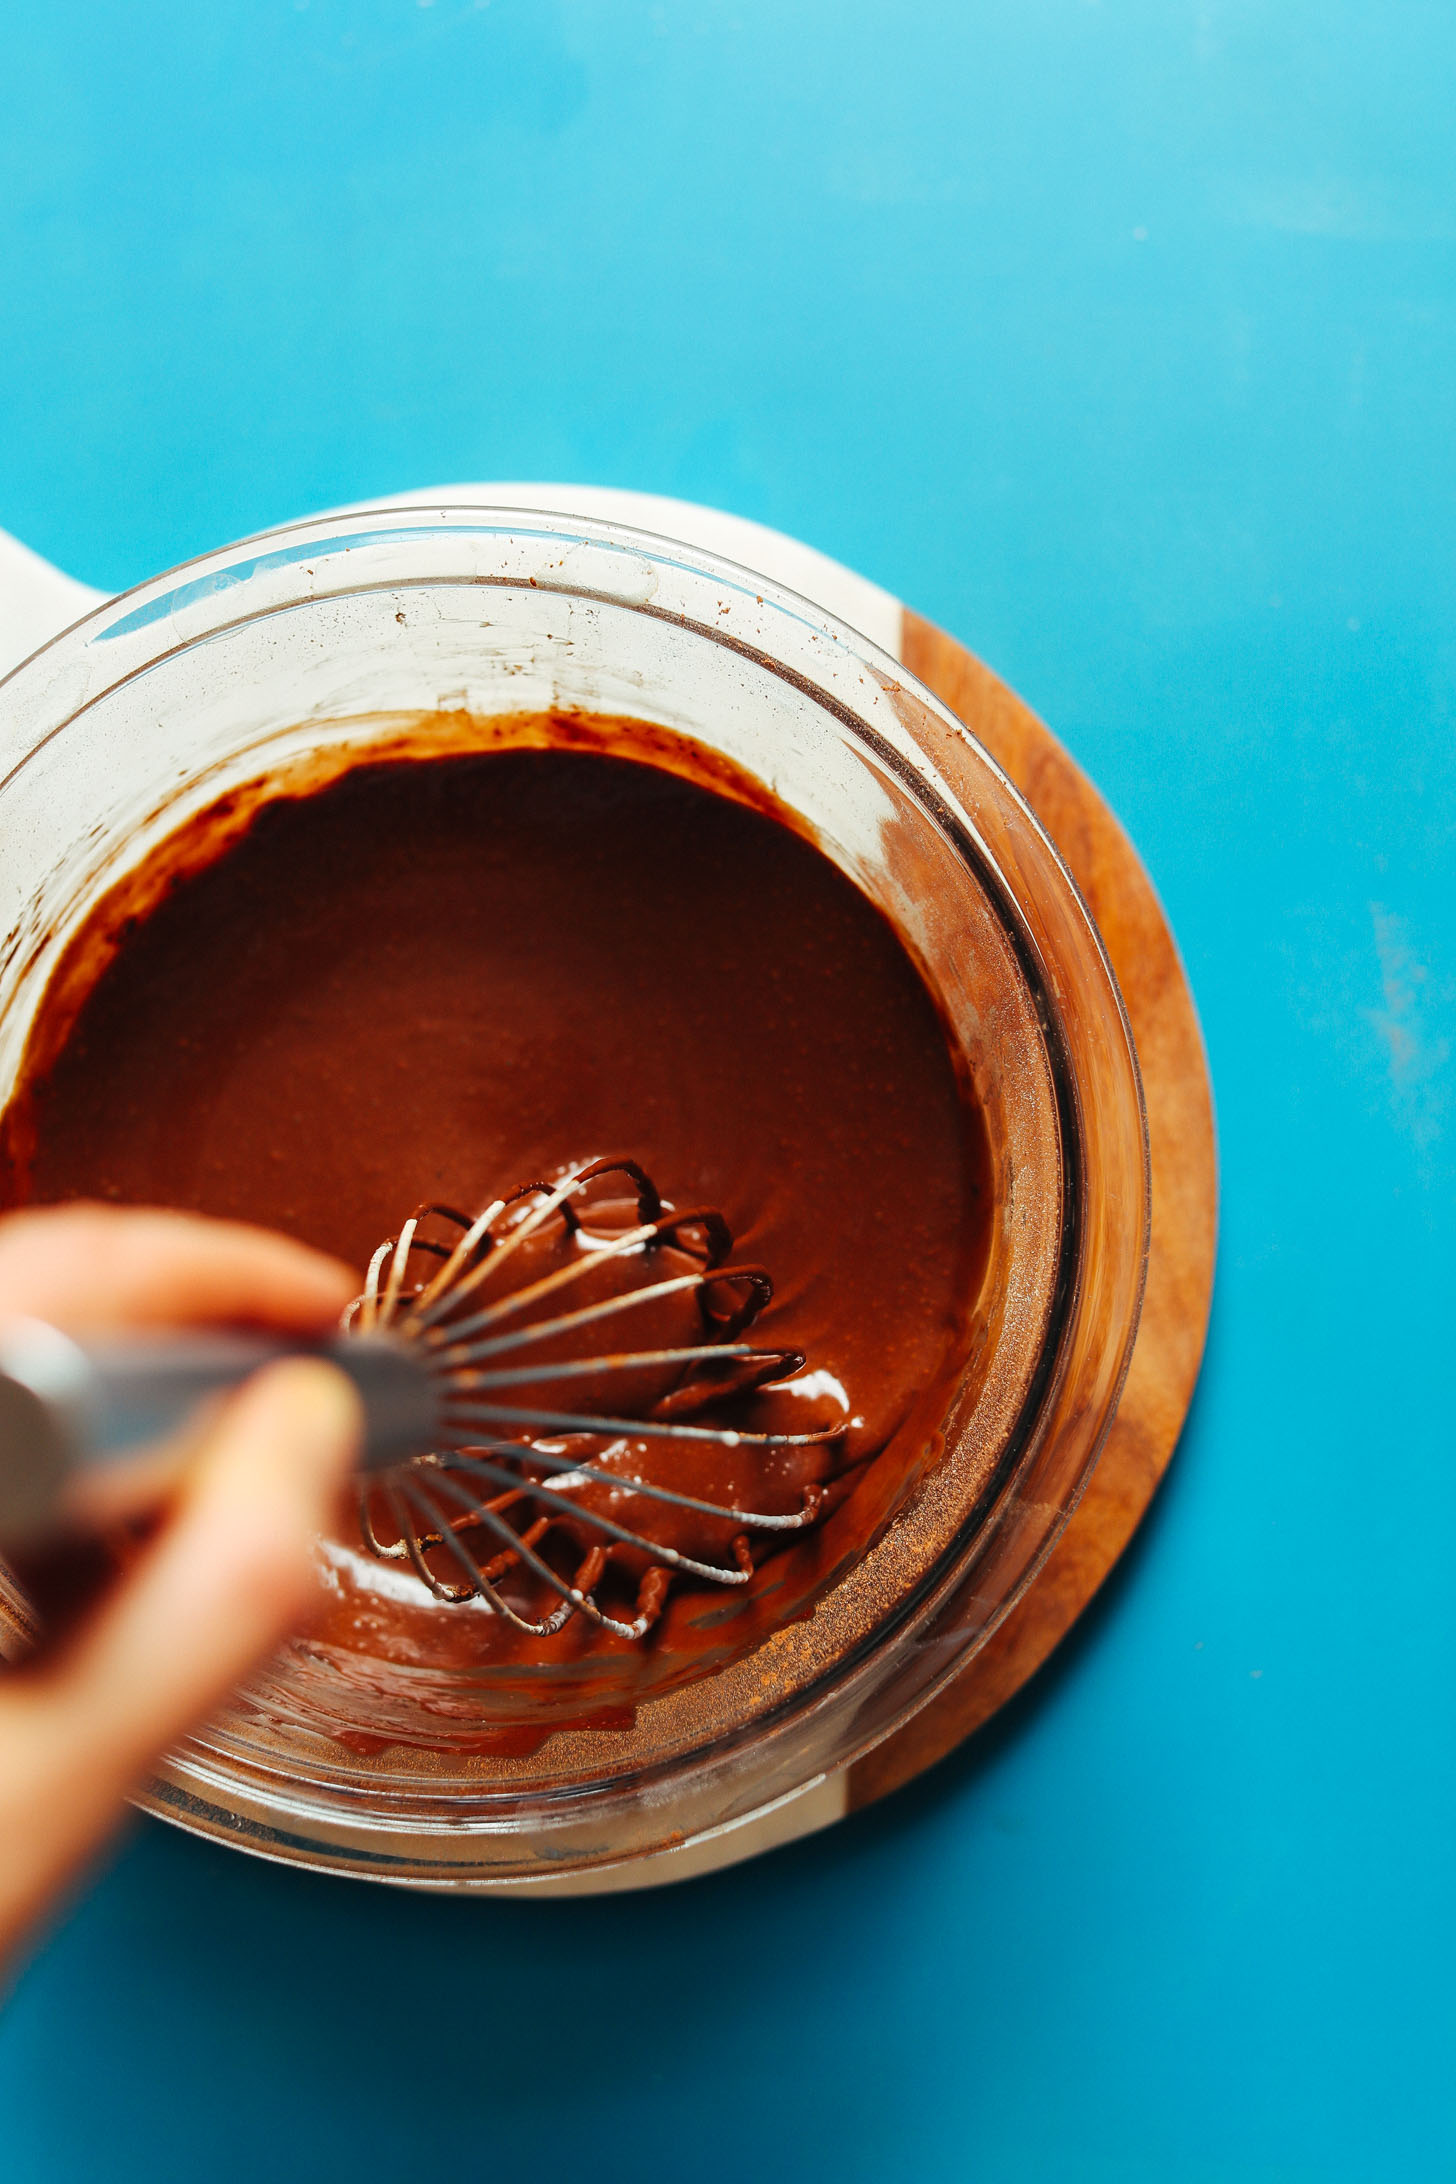 FEEL GOOD Vegan Hot Chocolate! 7 ingredients, naturally sweetened, SO creamy and rich! #vegan #glutenfree #plantbased #hotchocolate #dessert #chocolate #minimalistbaker #recipe